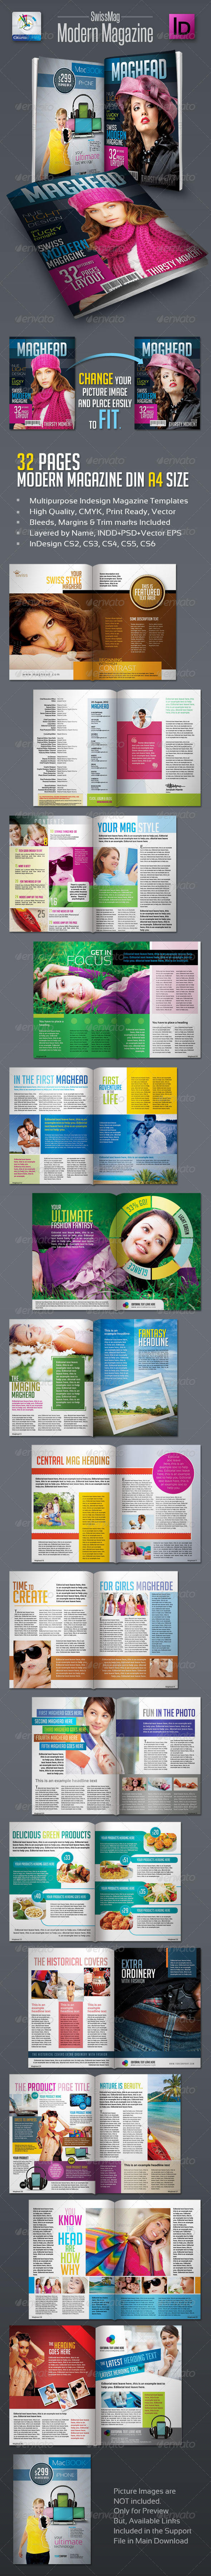 GraphicRiver SwissMag Modern Magazine Templates 32pages 2579872